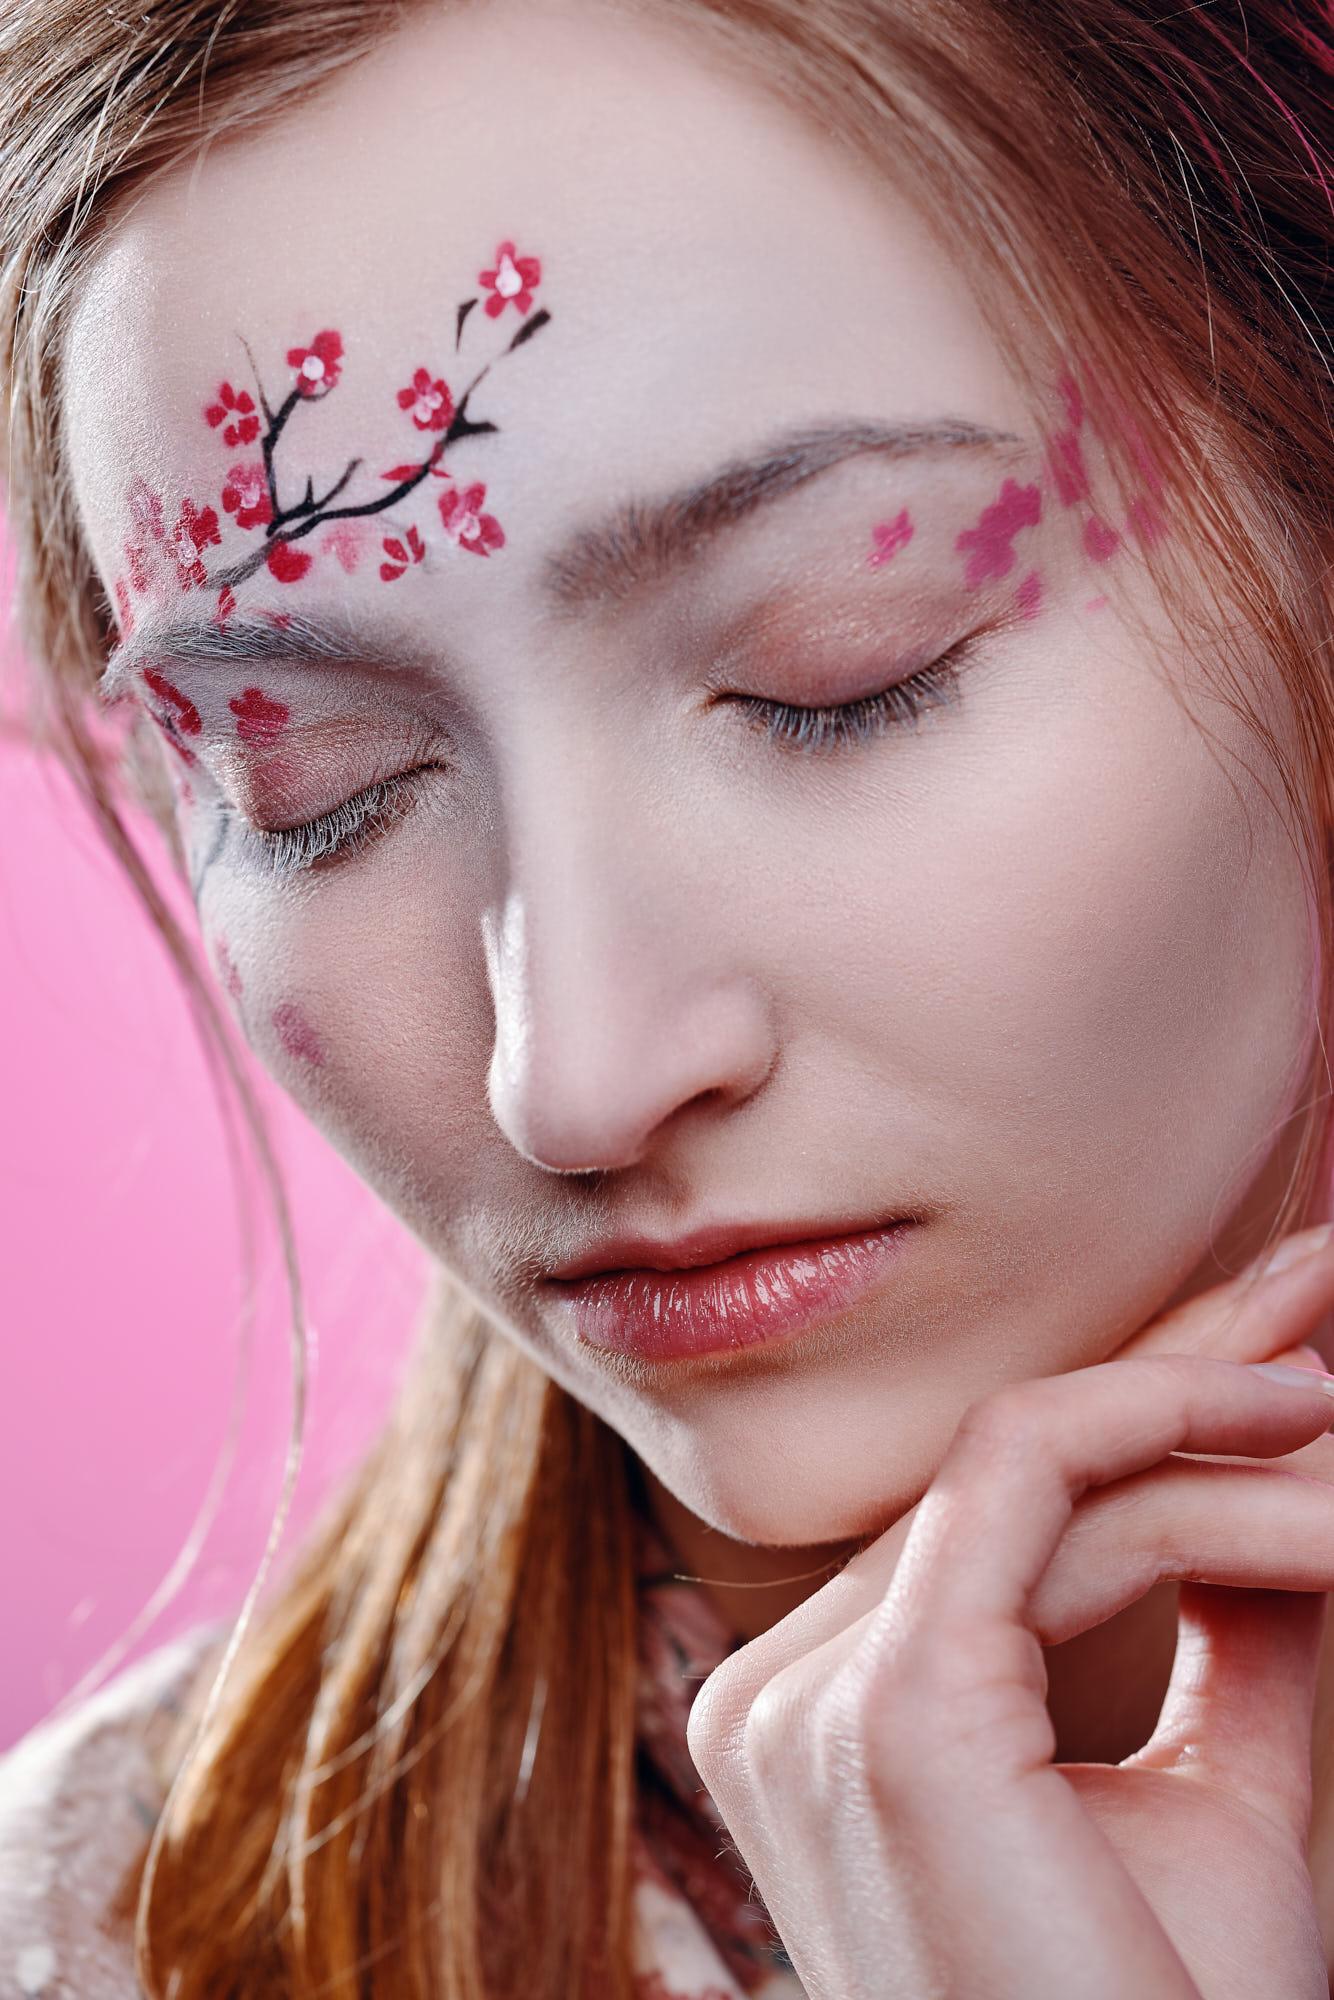 Lex & Josh Tiffanys Pro Makeup Spring Studio Shoot with Mika 13.jpg